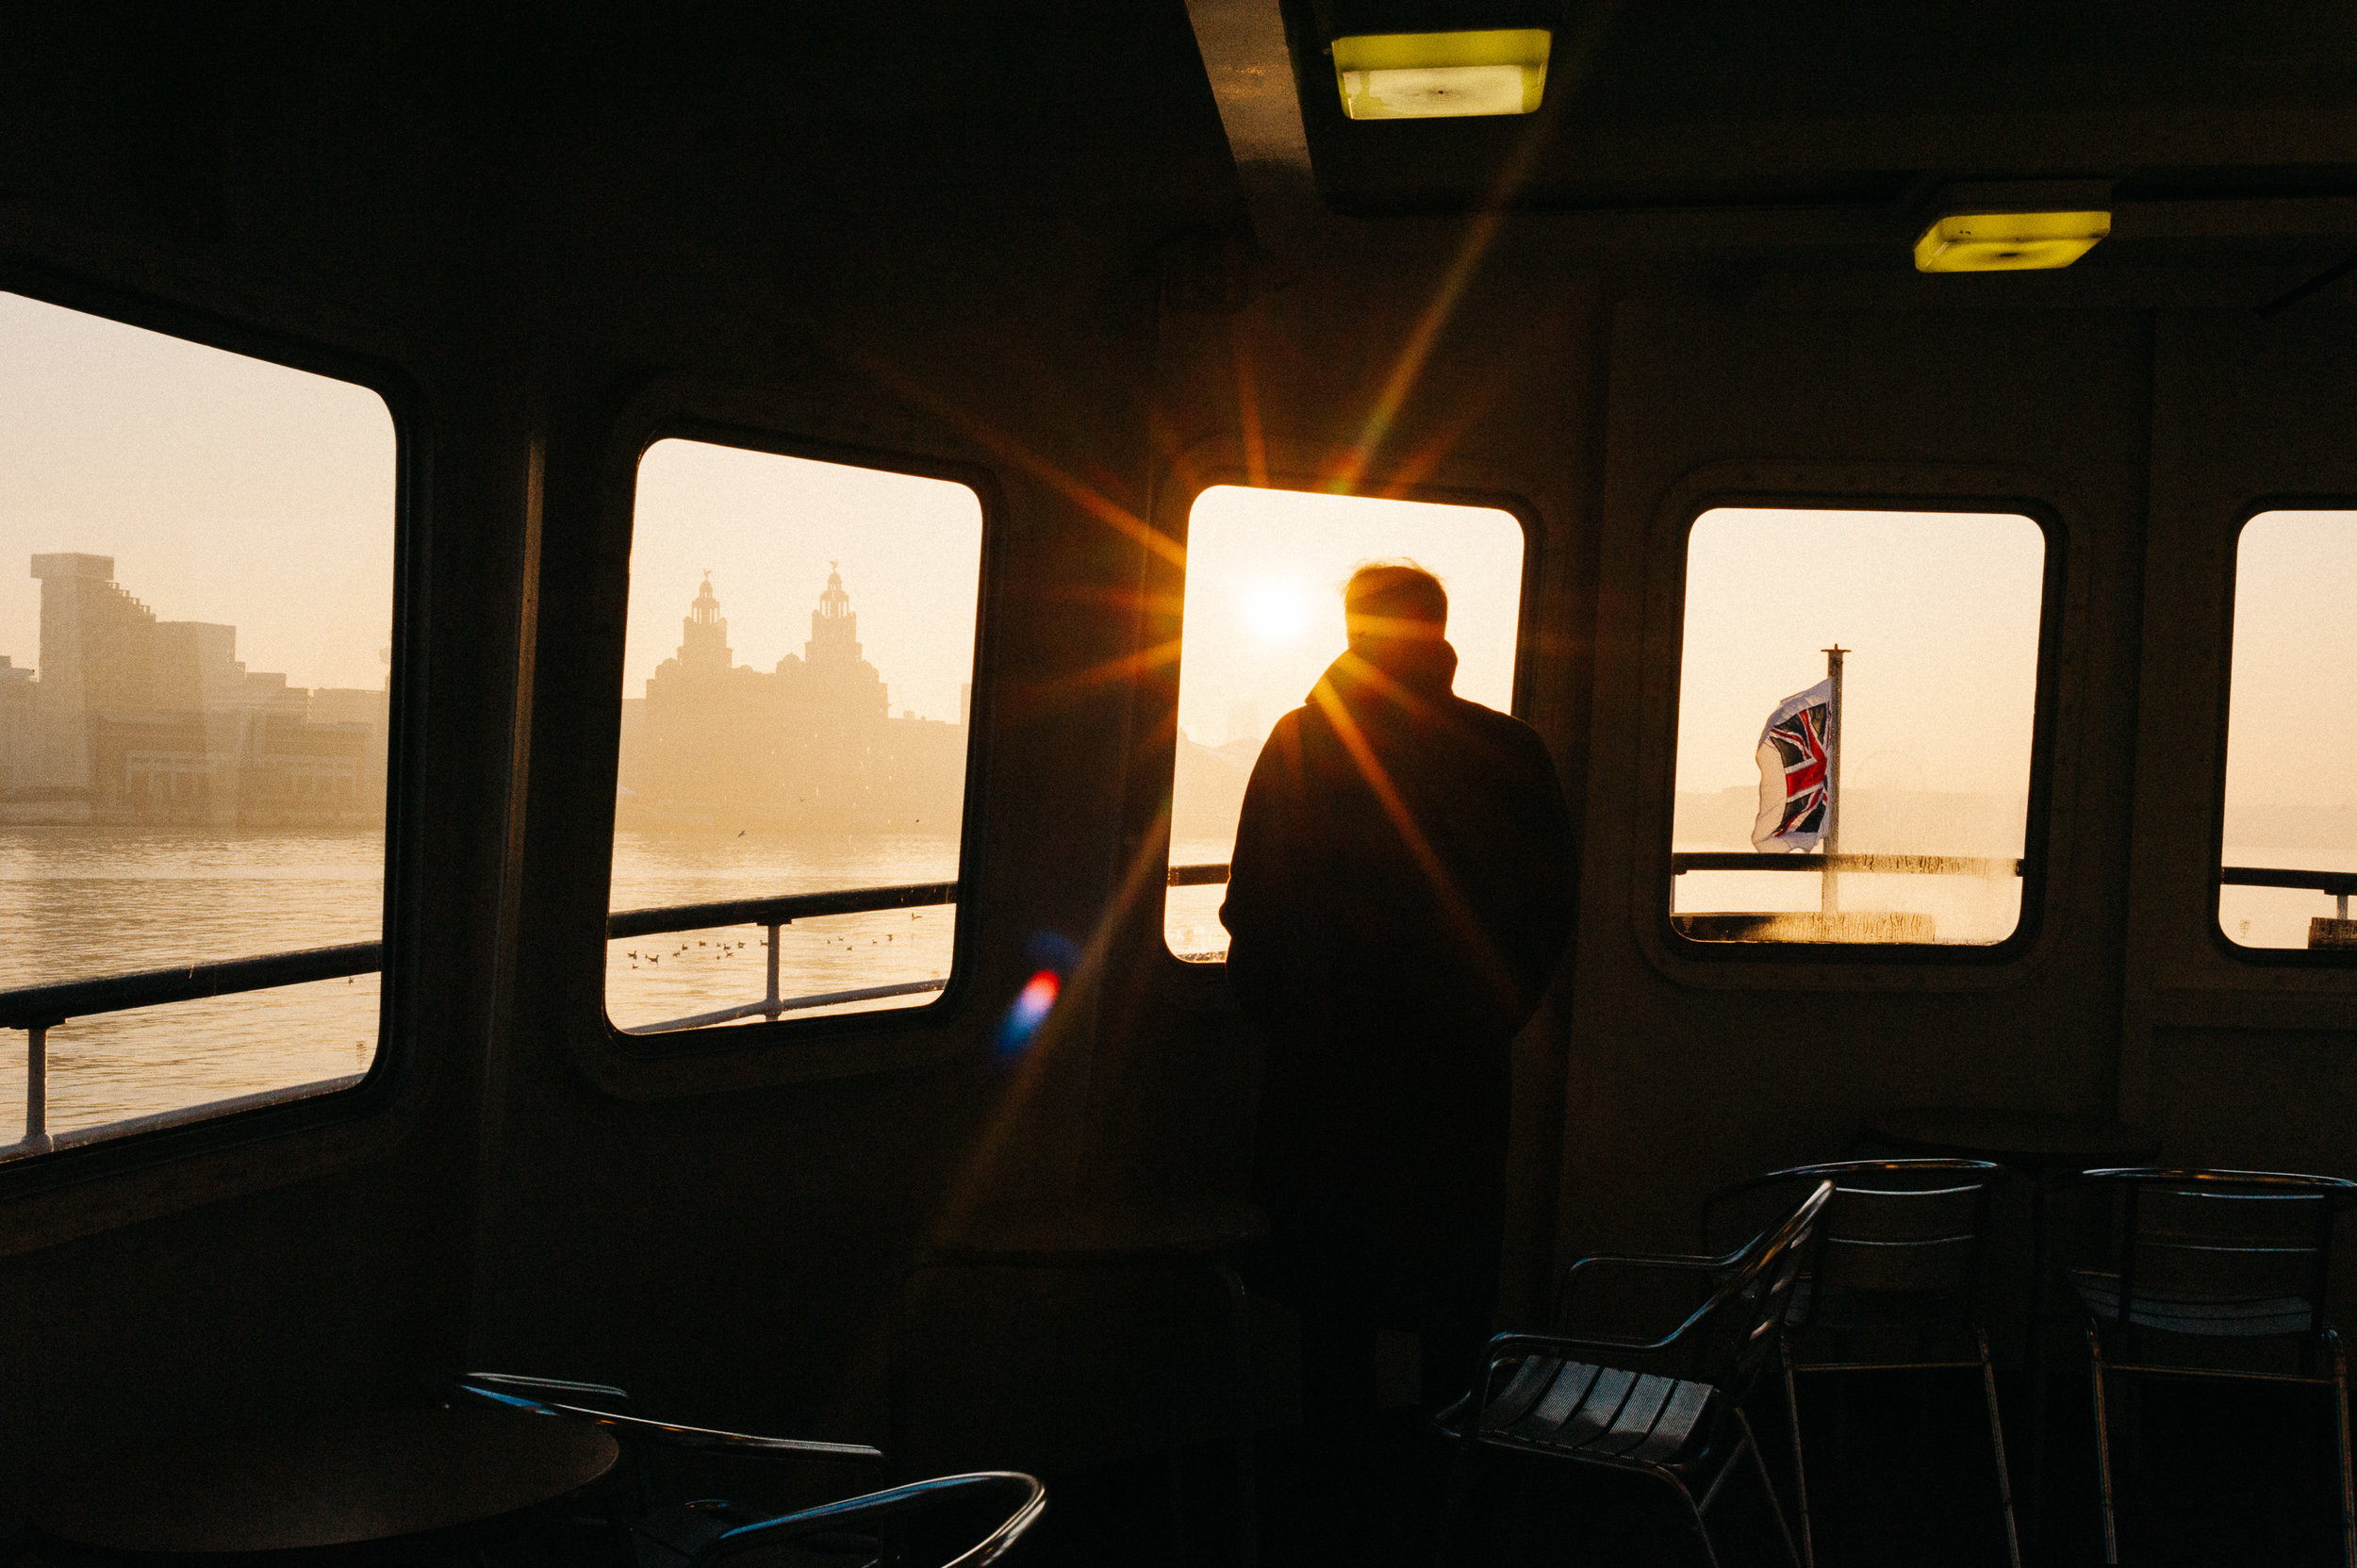 Ferry-8591-pete-carr.jpg